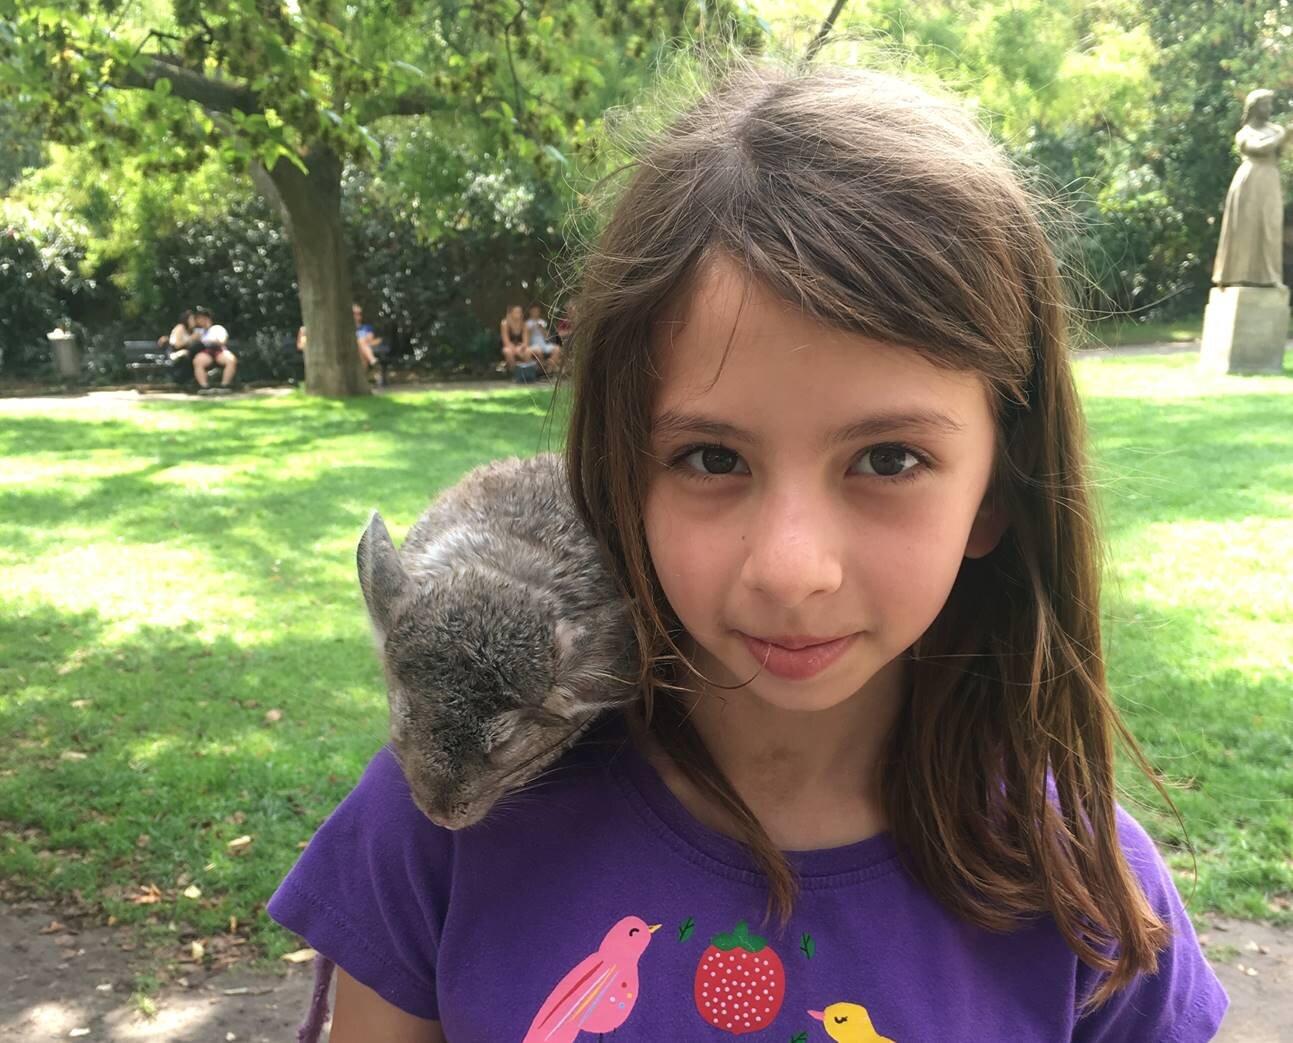 Matt's daughter loves nature and animals.